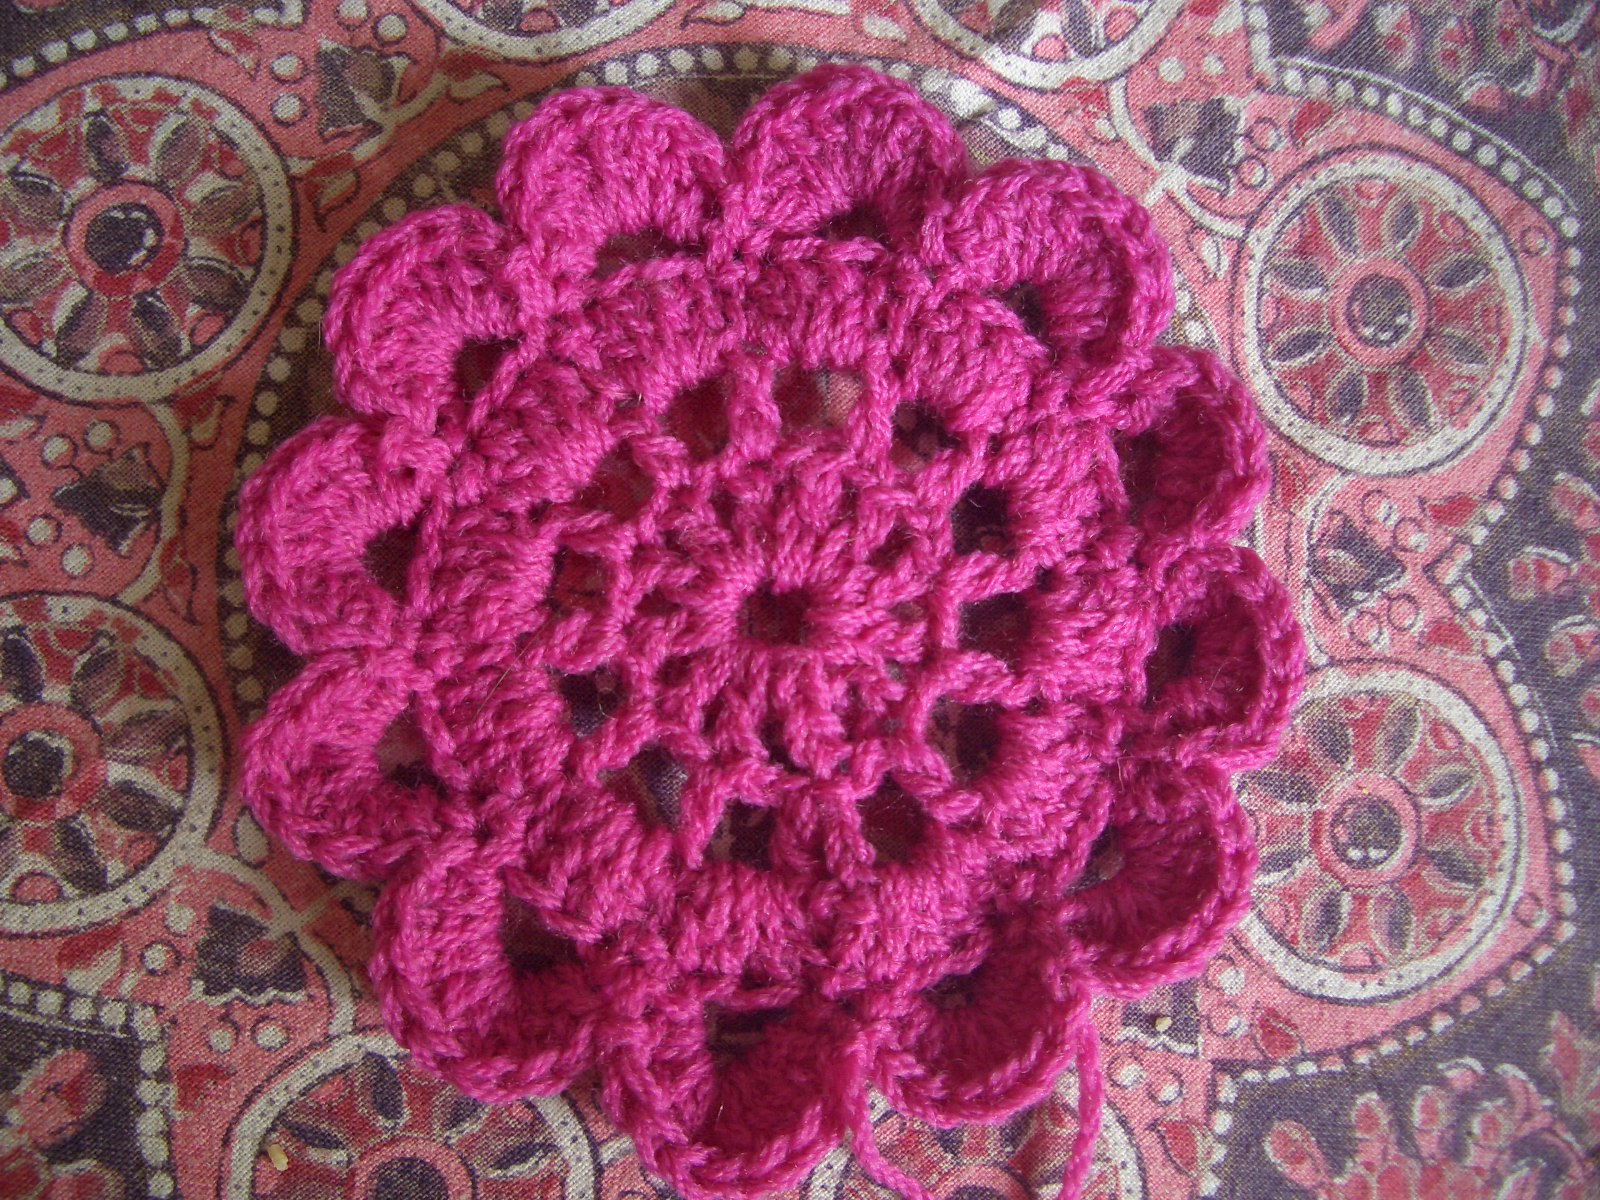 Japanese Flower Crochet Pattern Diagram Flowers Download